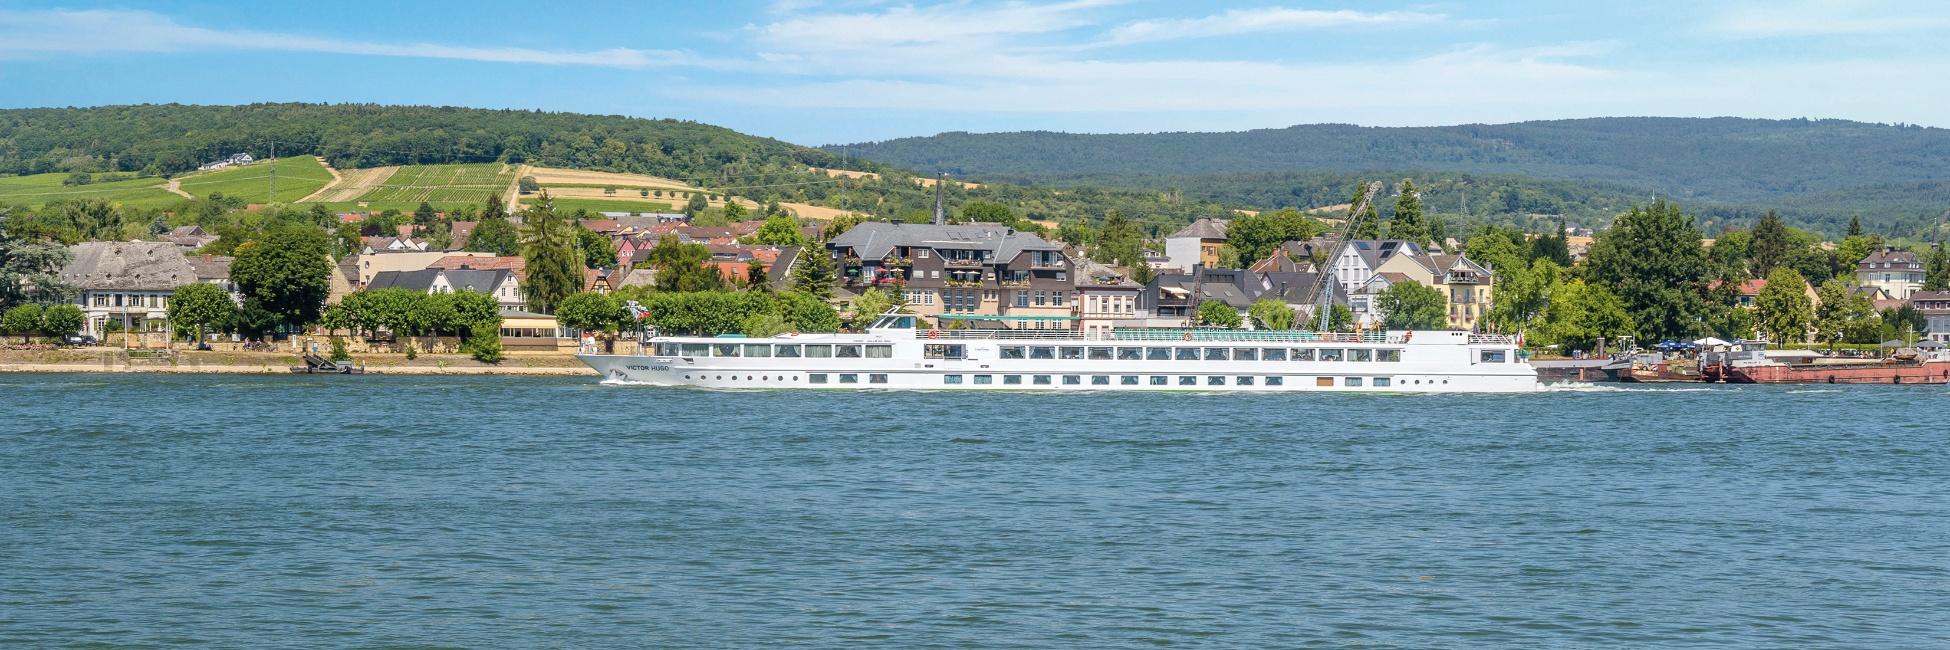 Le Victor Hugo sur le Rhin et le Danube